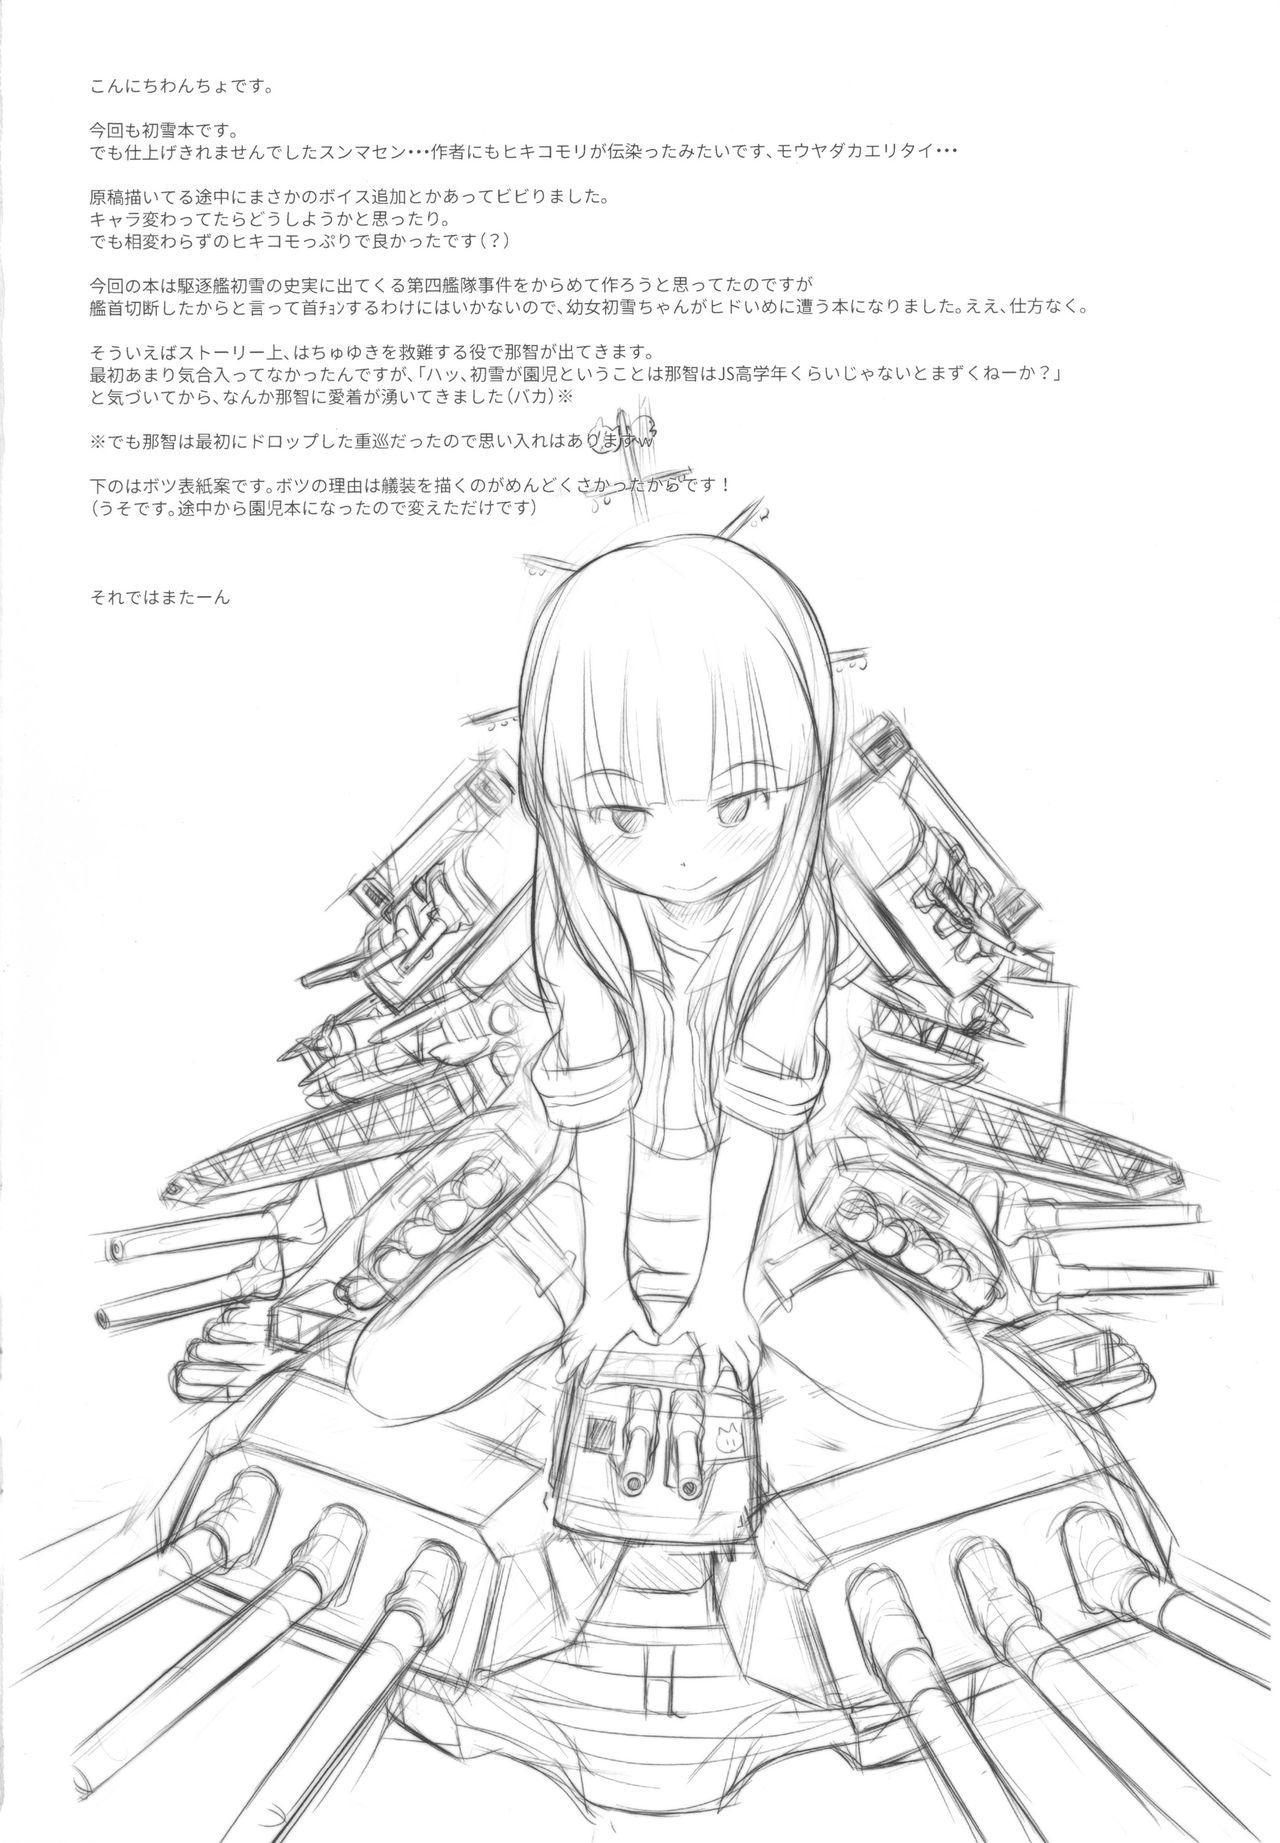 Kuchukukan Hachuyuki Monogatari 33